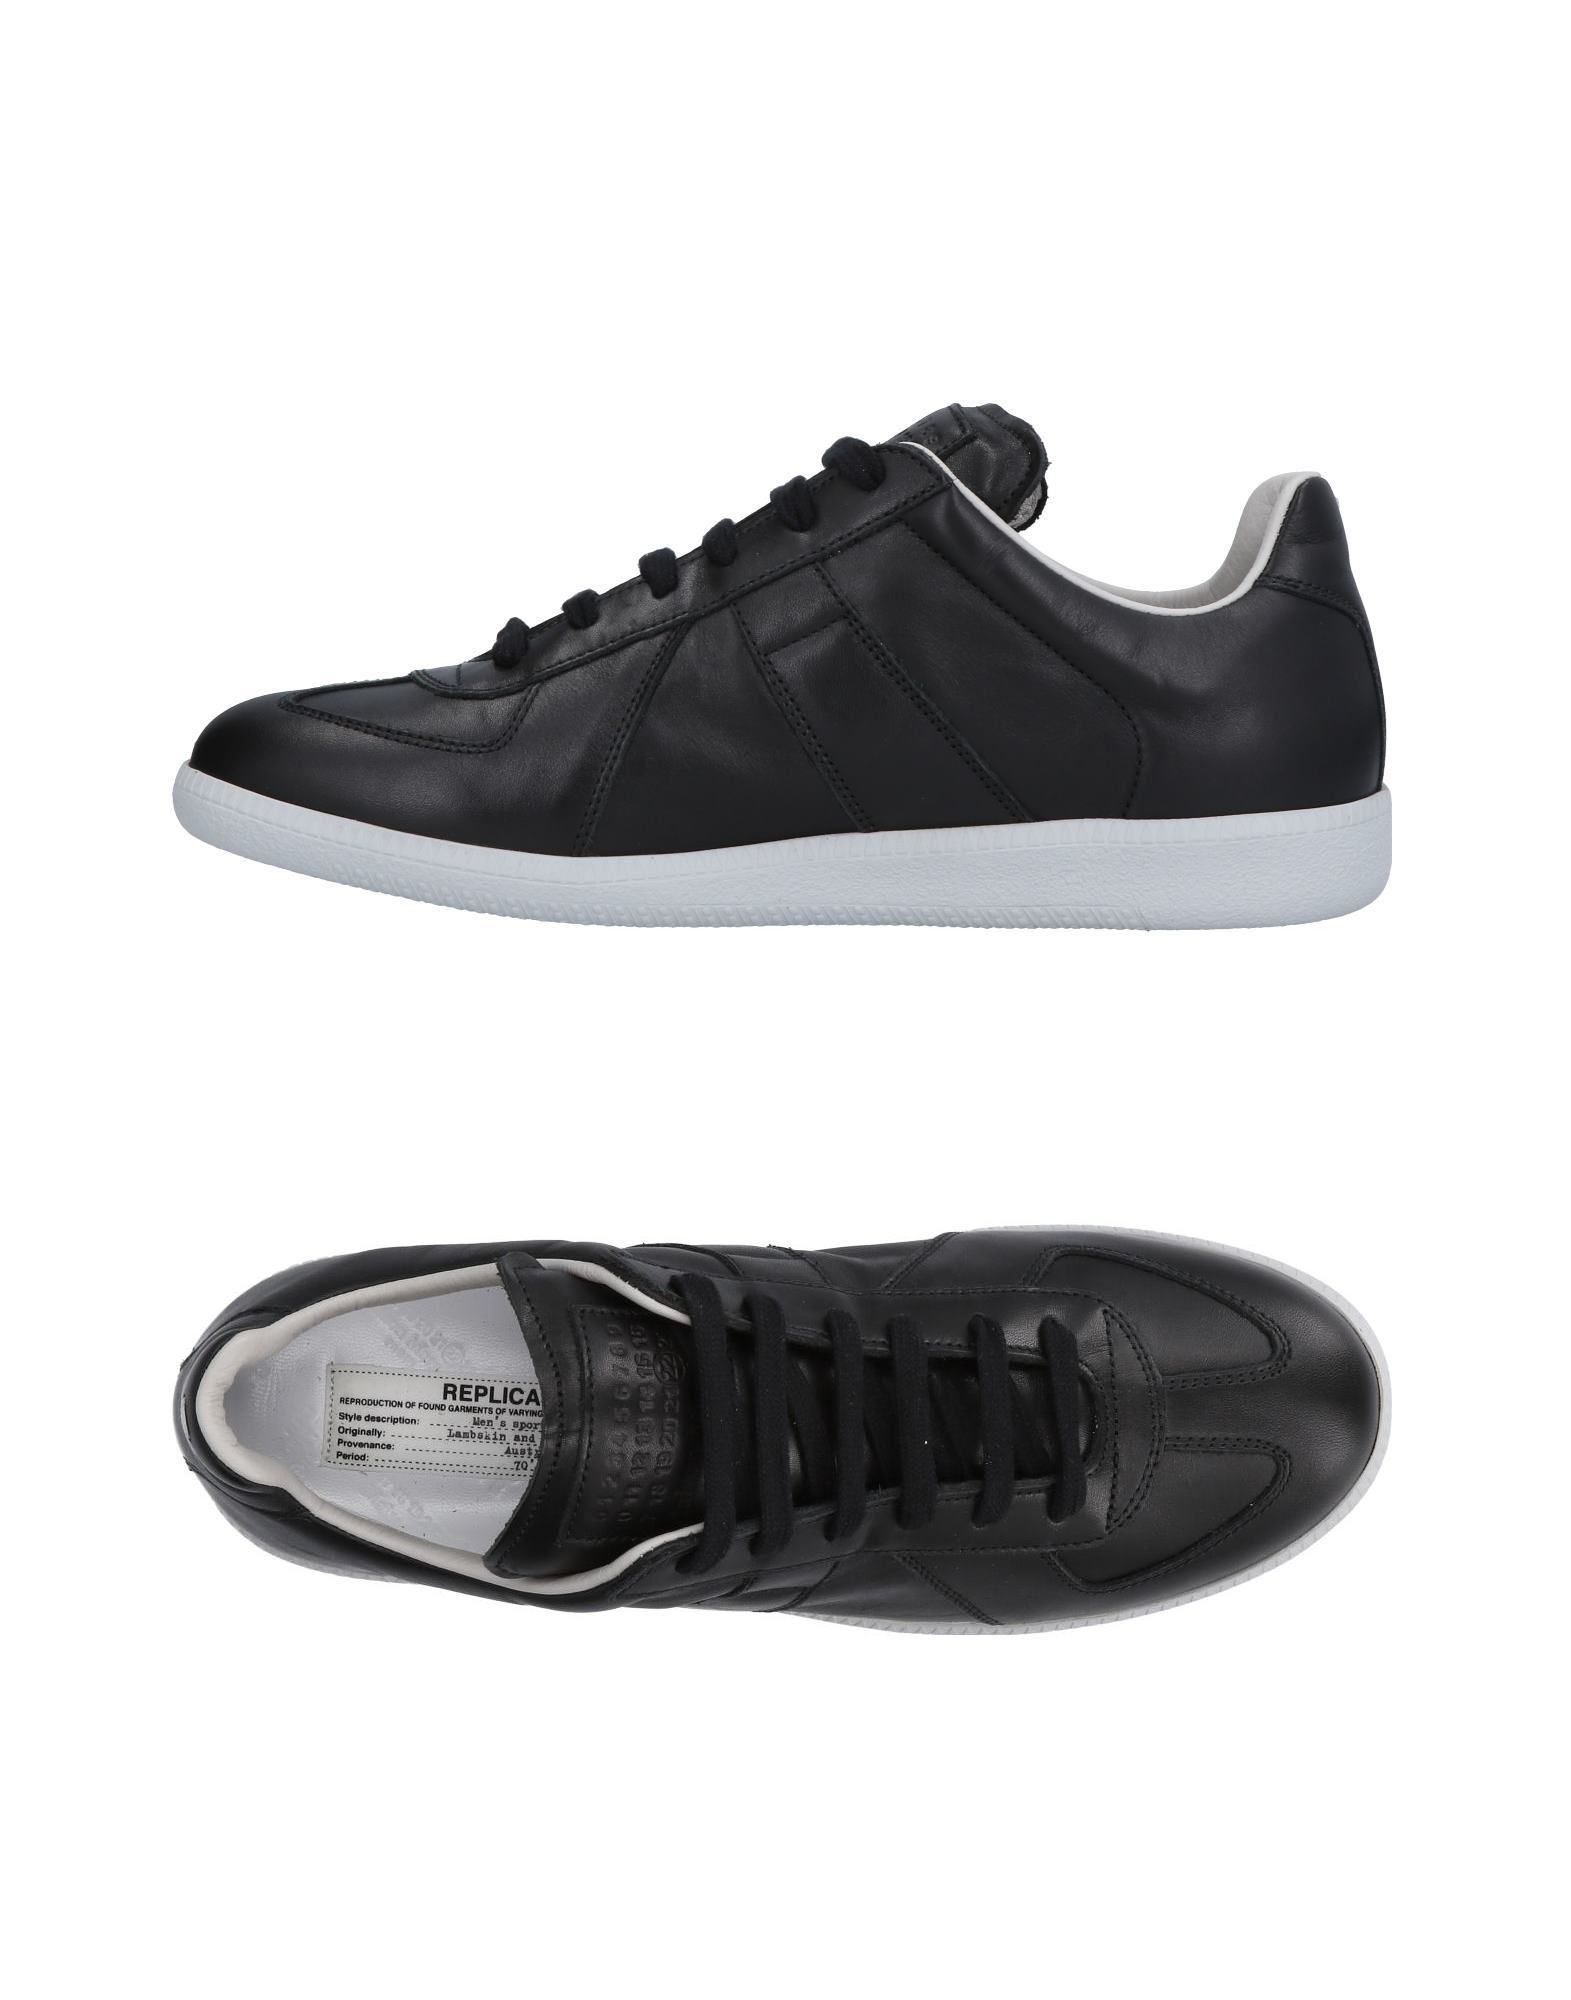 Maison Margiela Sneakers Herren  11472234GI Gute Qualität beliebte Schuhe